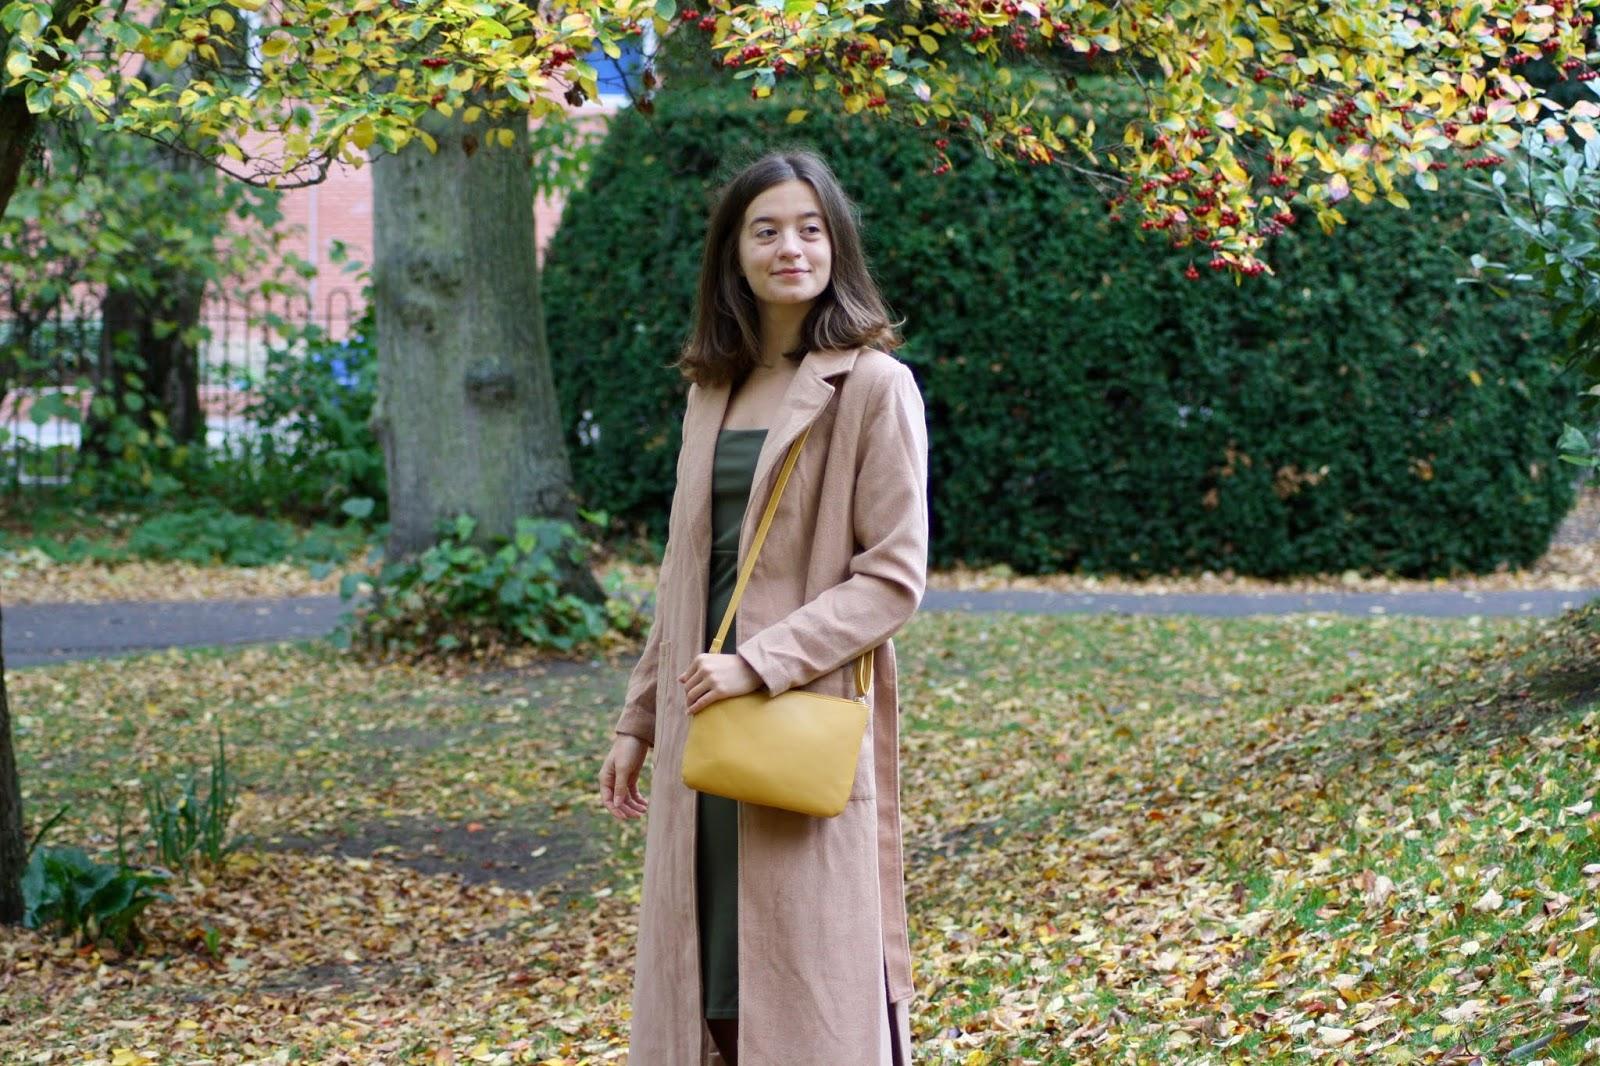 brunette woman standing amongst autumn trees, wearing brown jacket and khaki dress